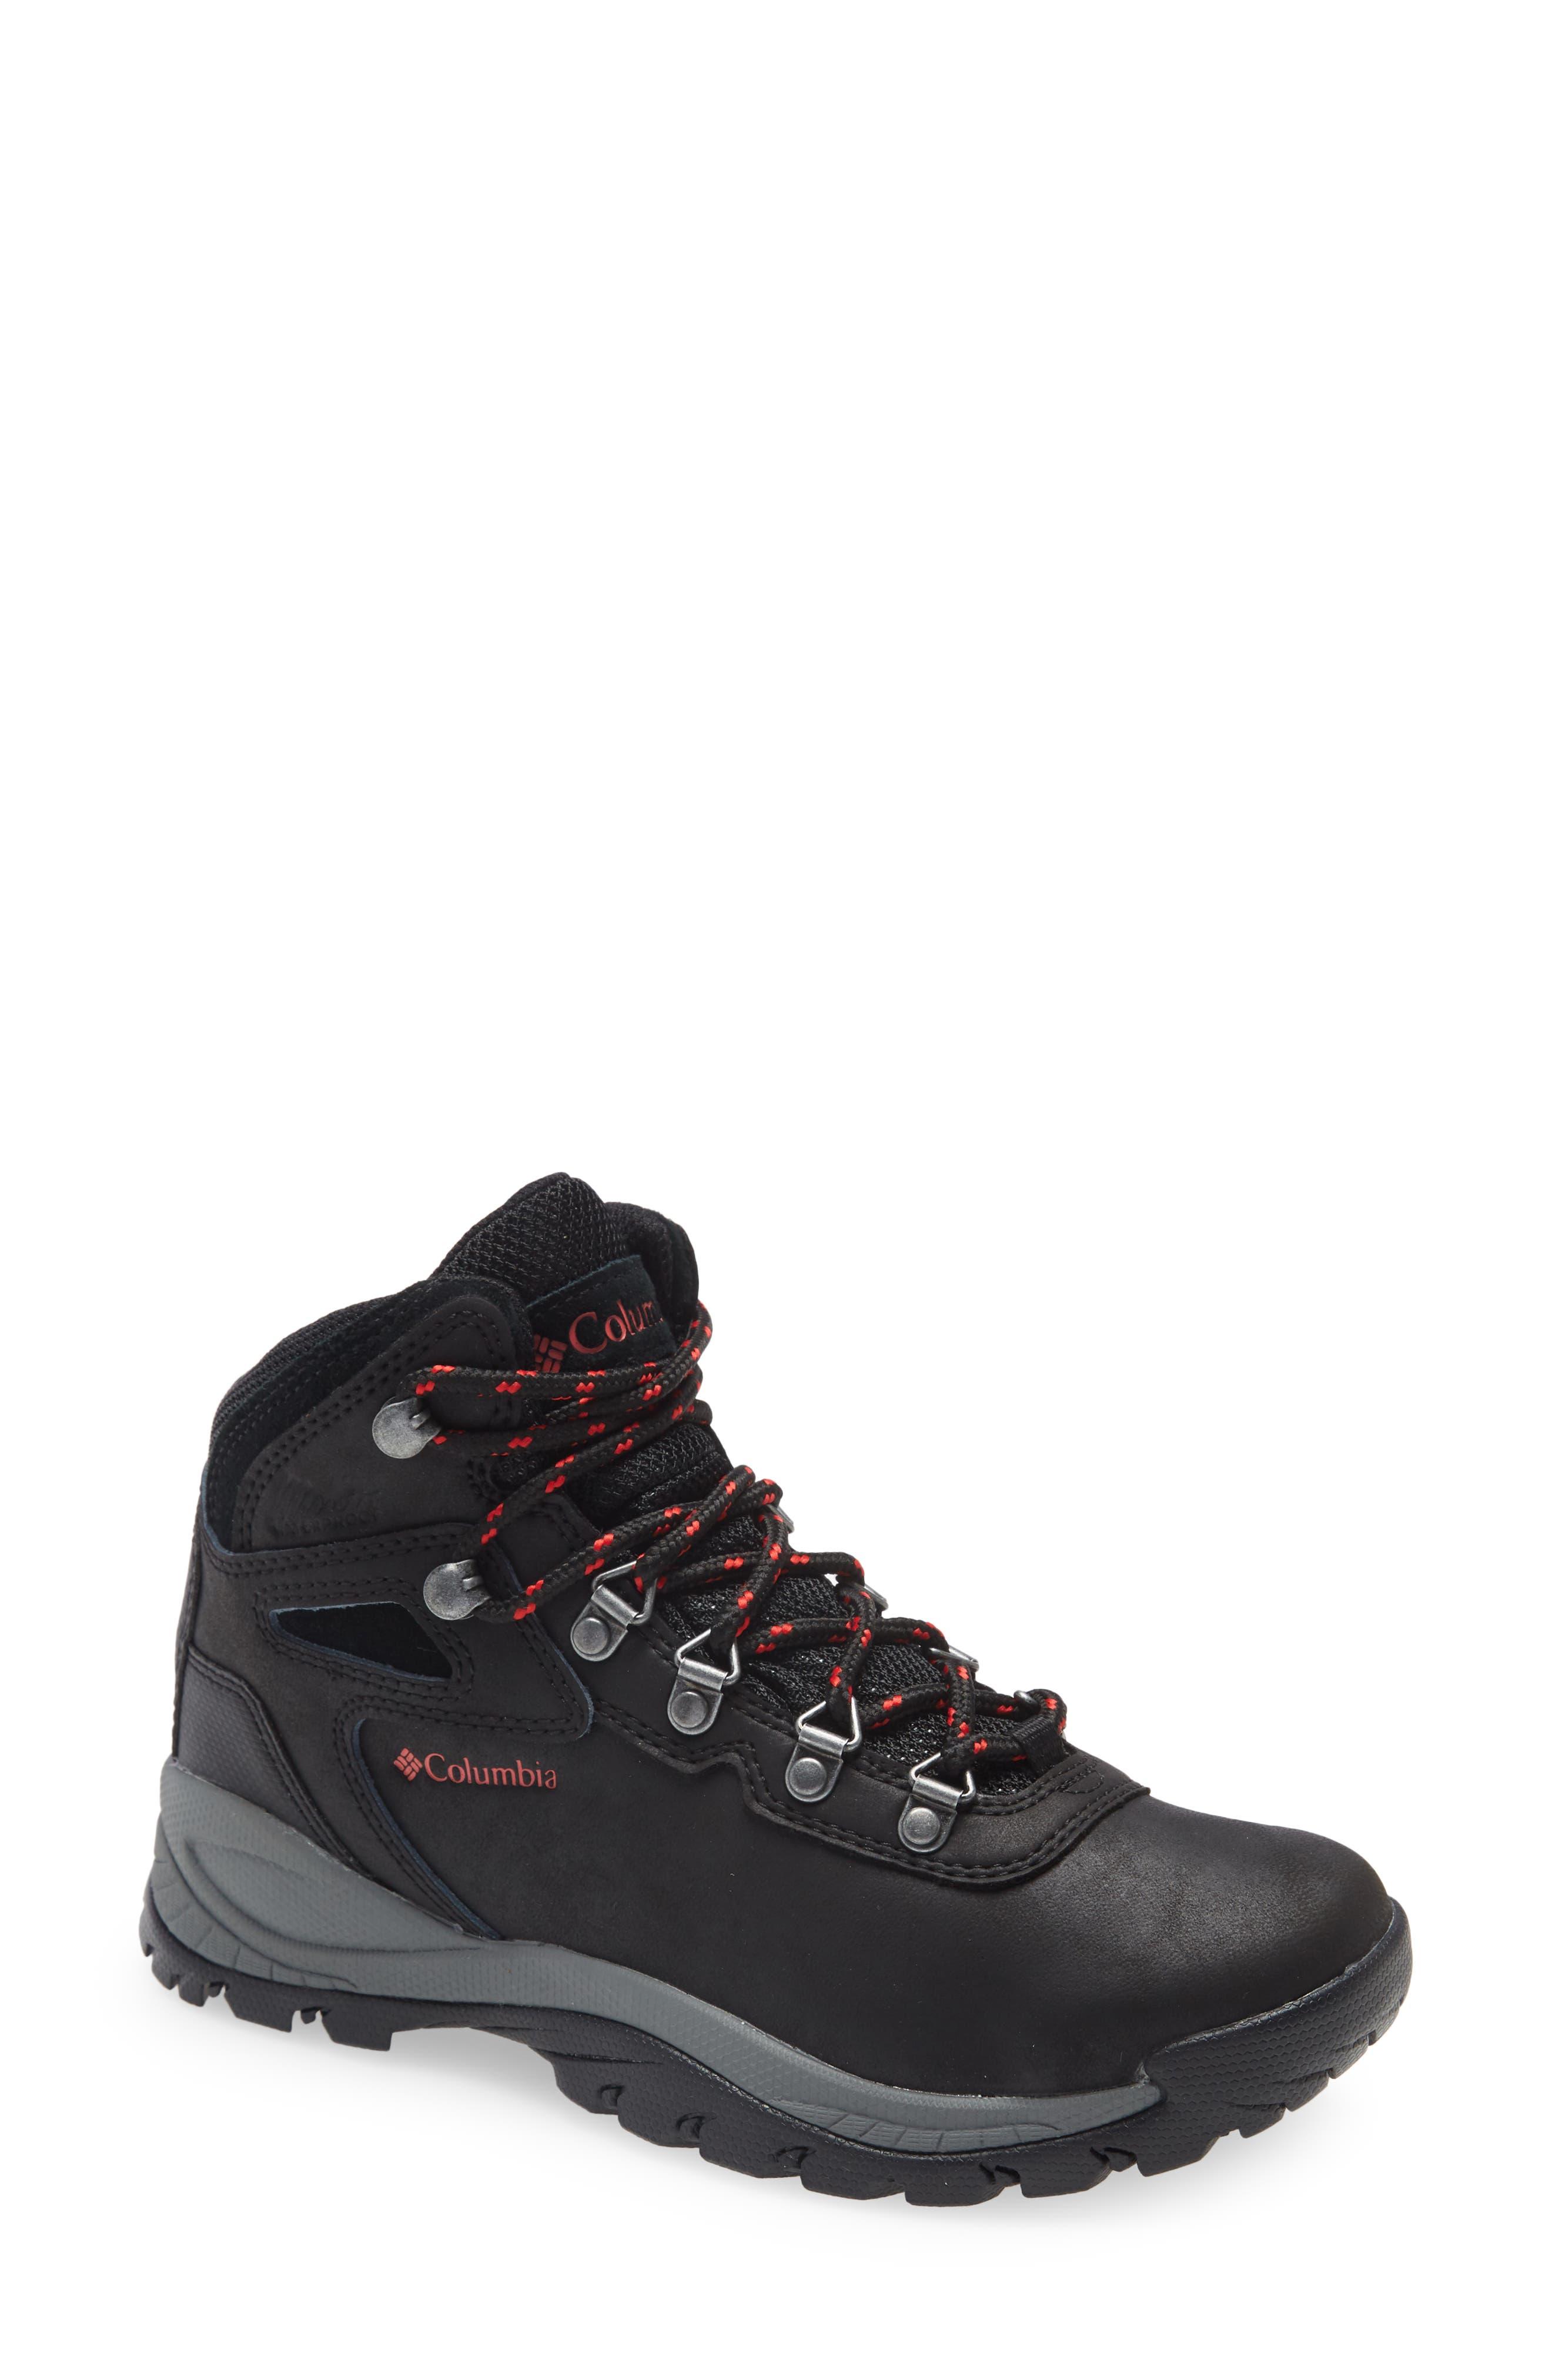 Newton Ridge(TM) Plus Wide Waterproof Hiking Boot